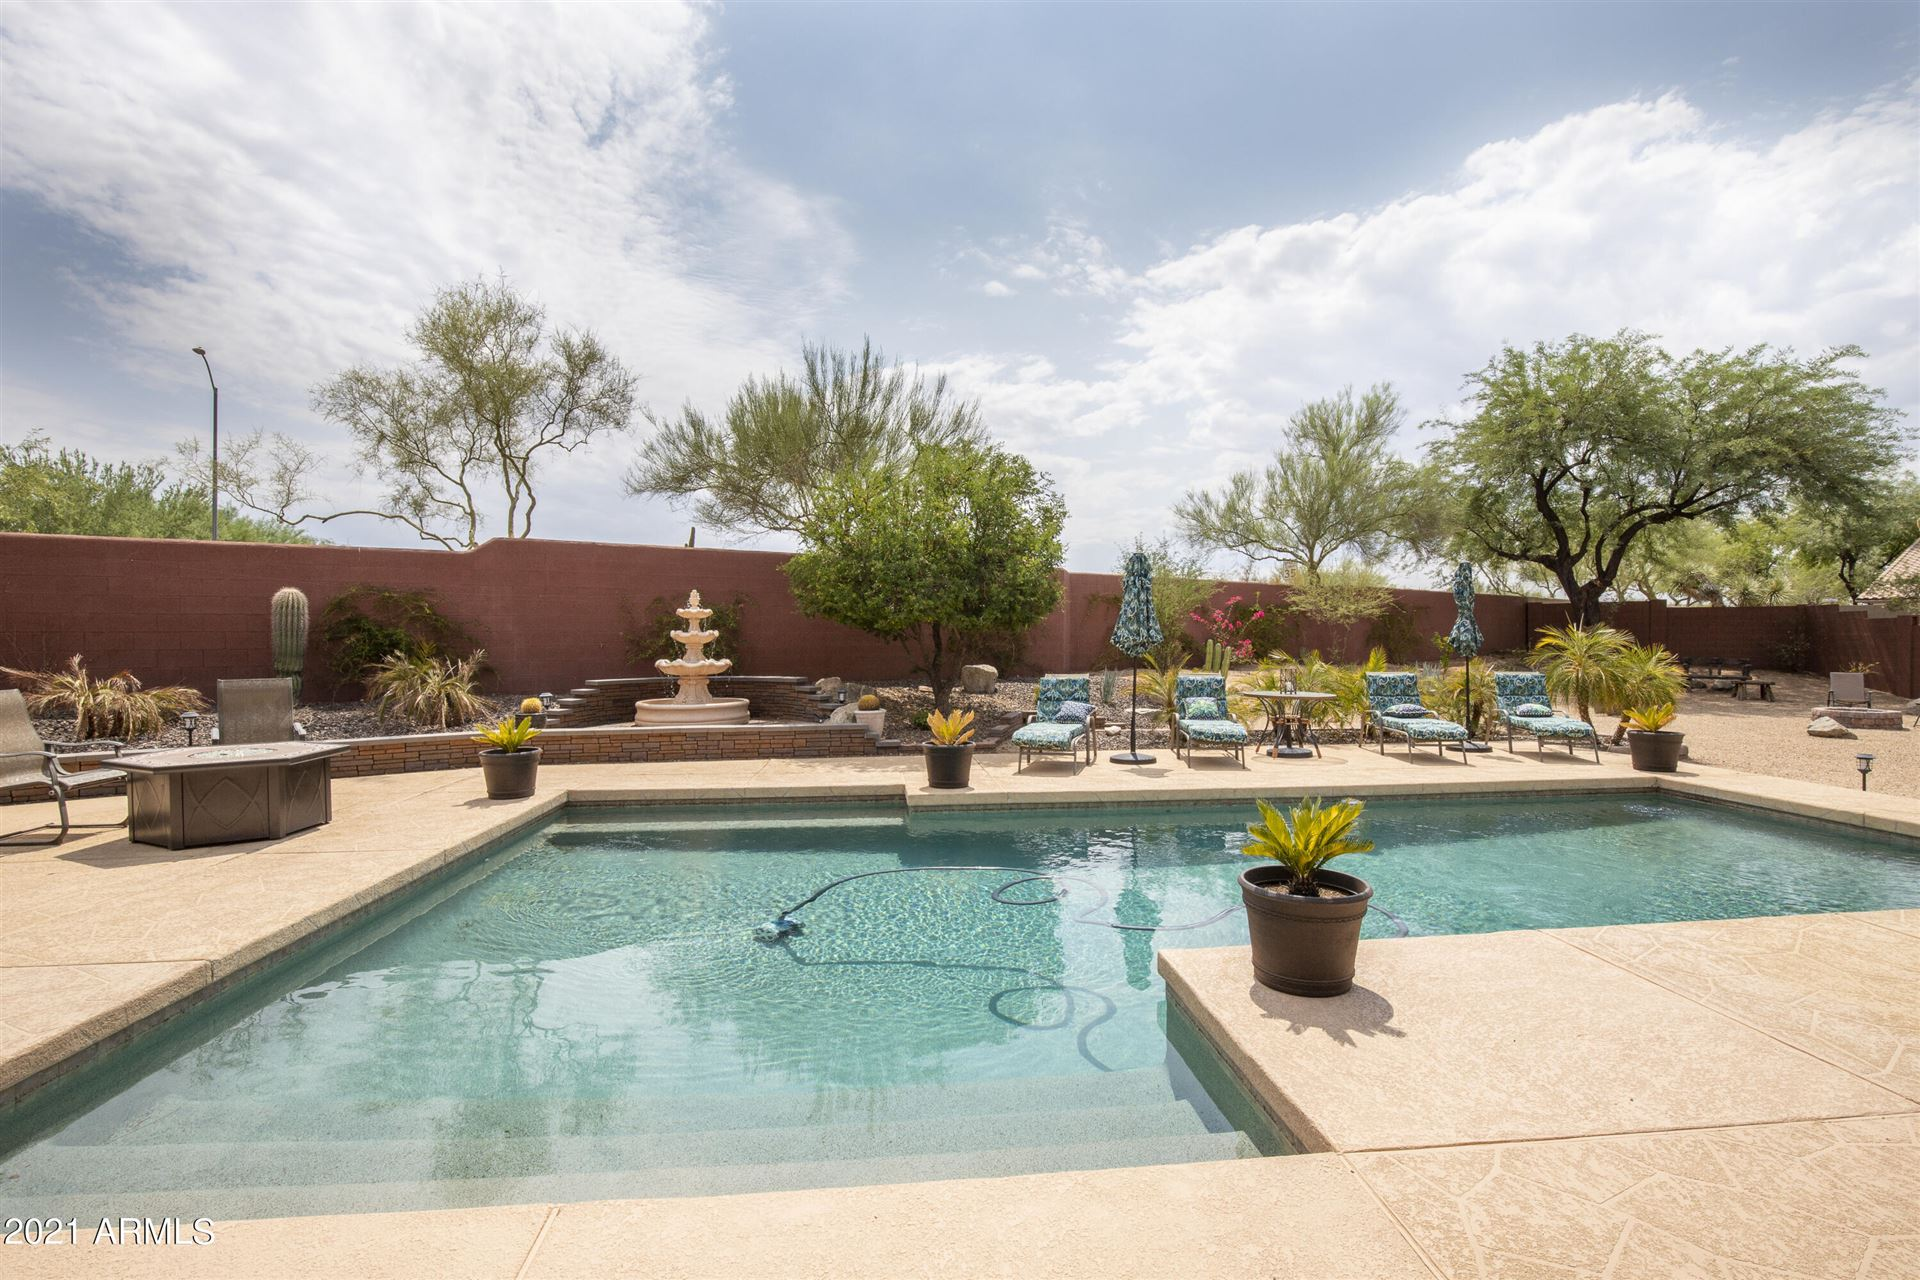 Photo of 4657 E MONTGOMERY Road, Cave Creek, AZ 85331 (MLS # 6266944)